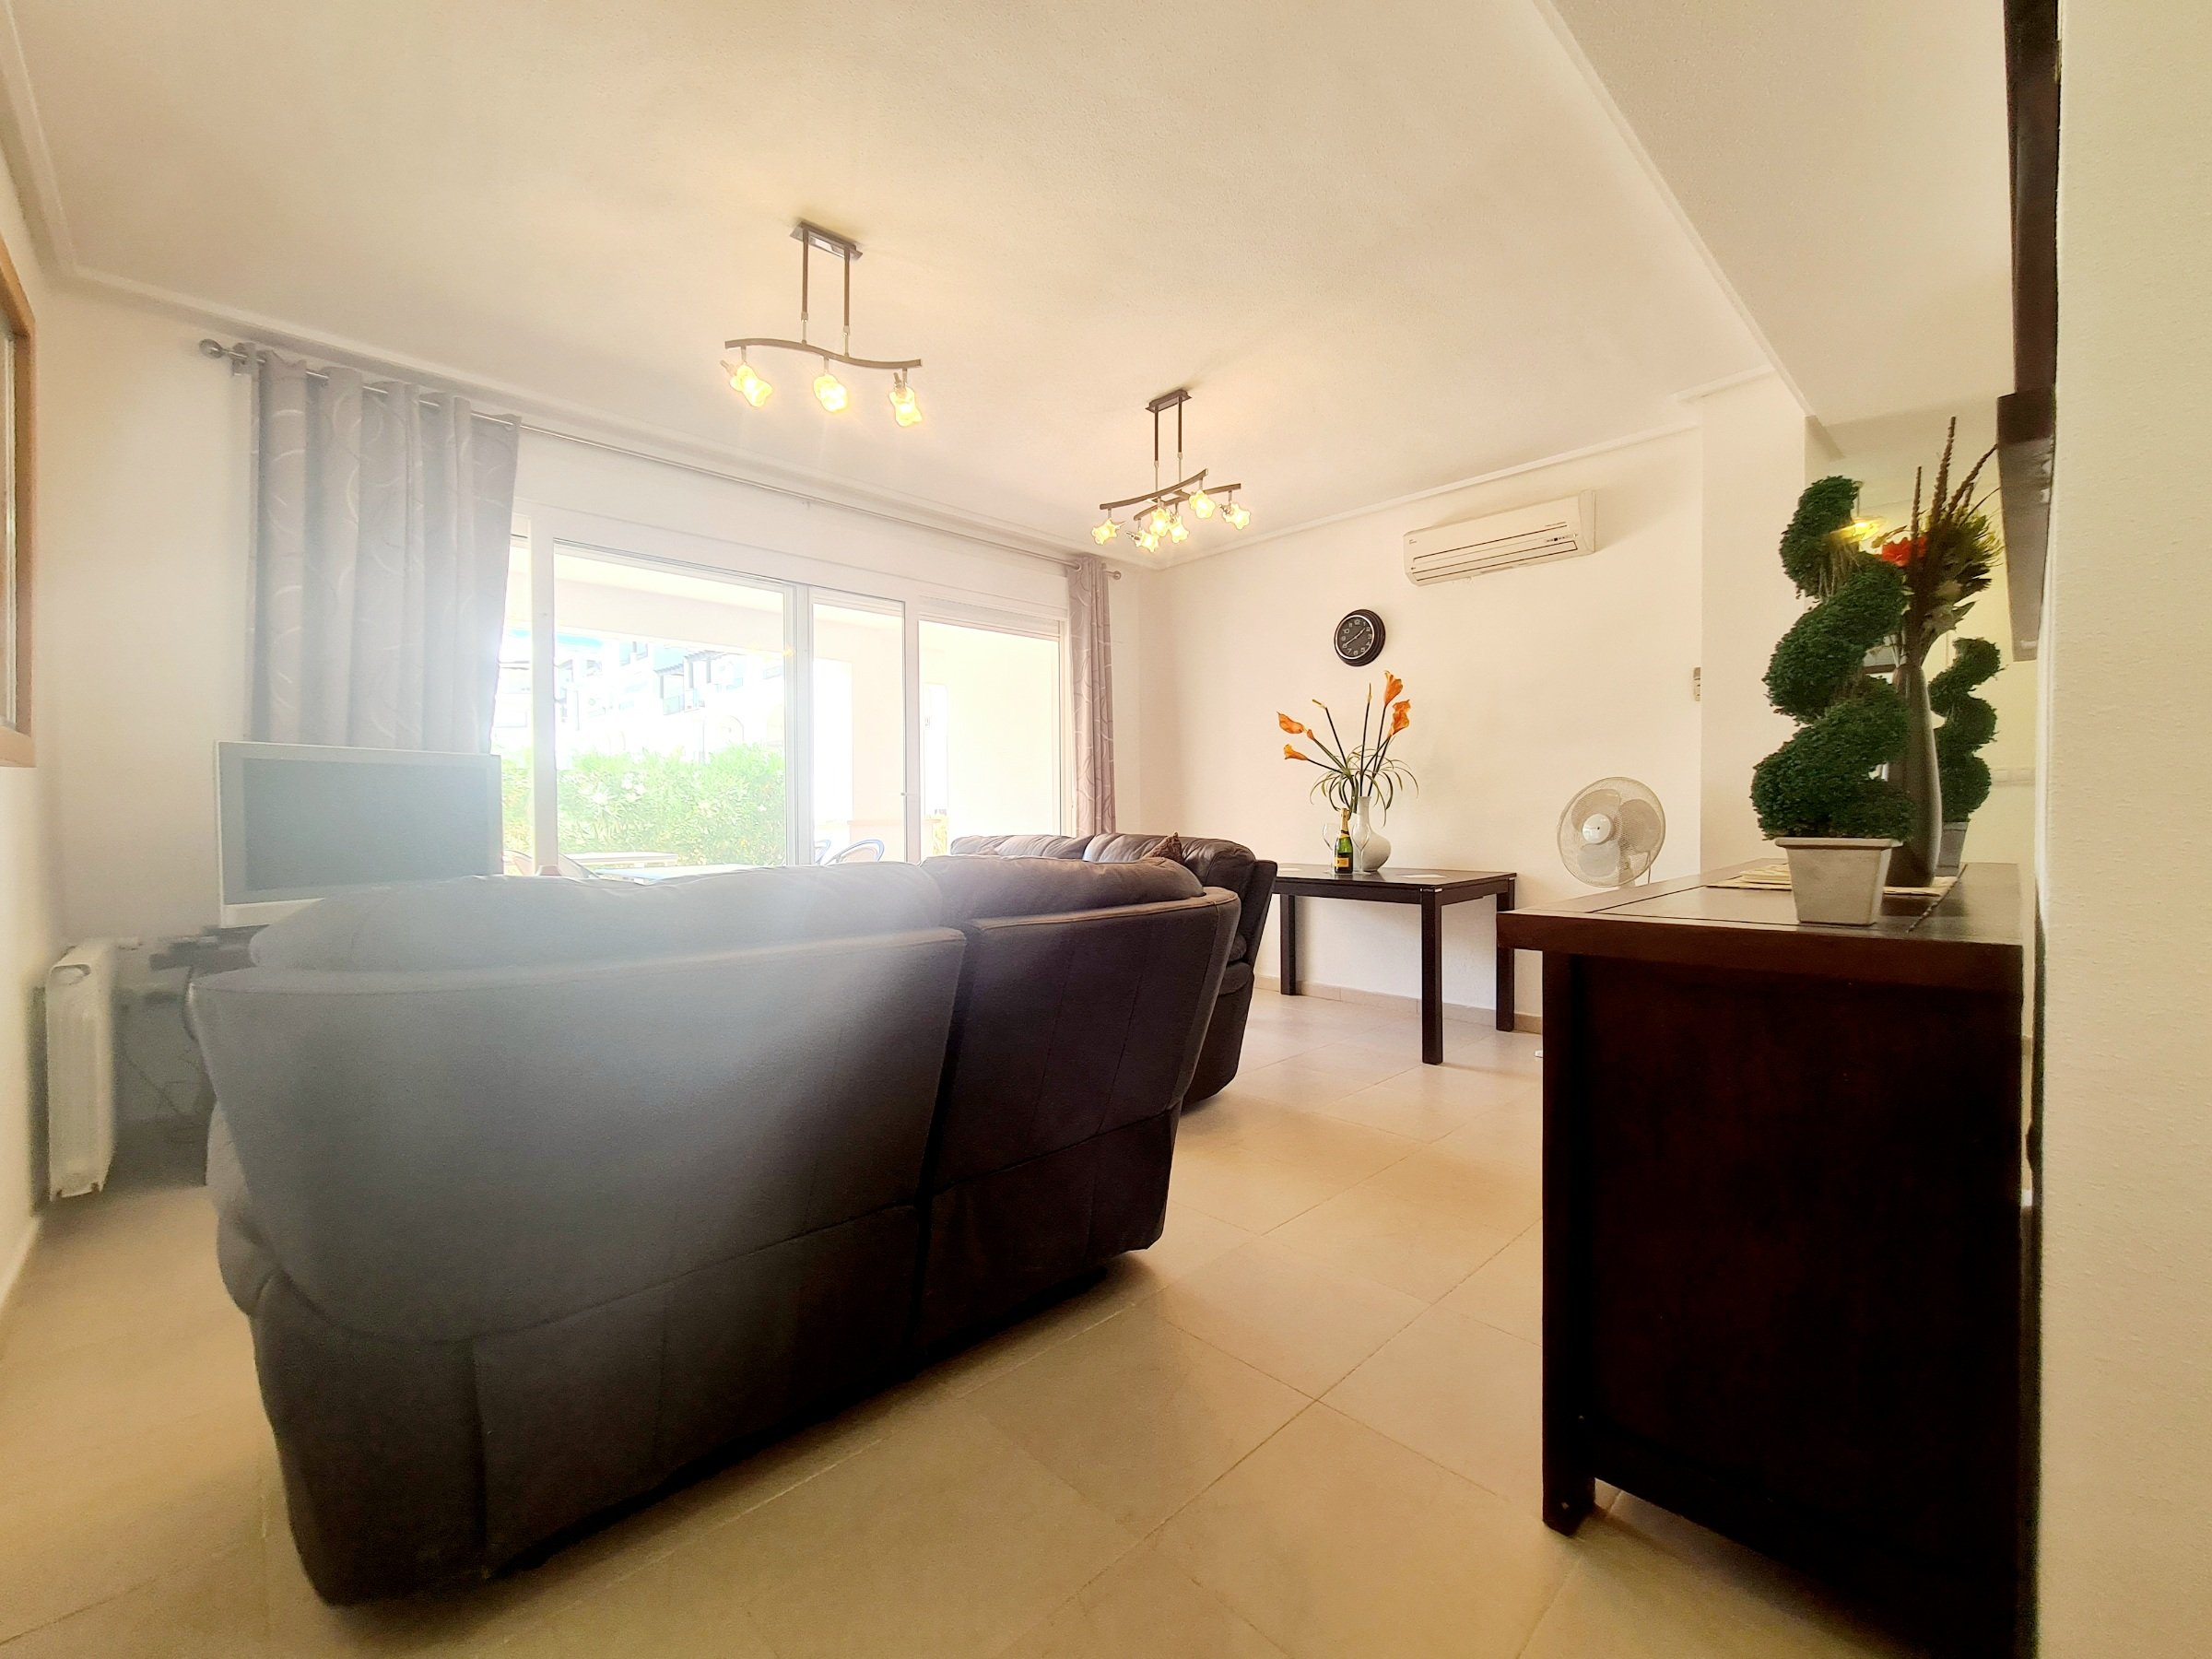 2 Bed 1 Bath Ground Floor Apartment For Sale – La Torre Golf Resort – Murcia